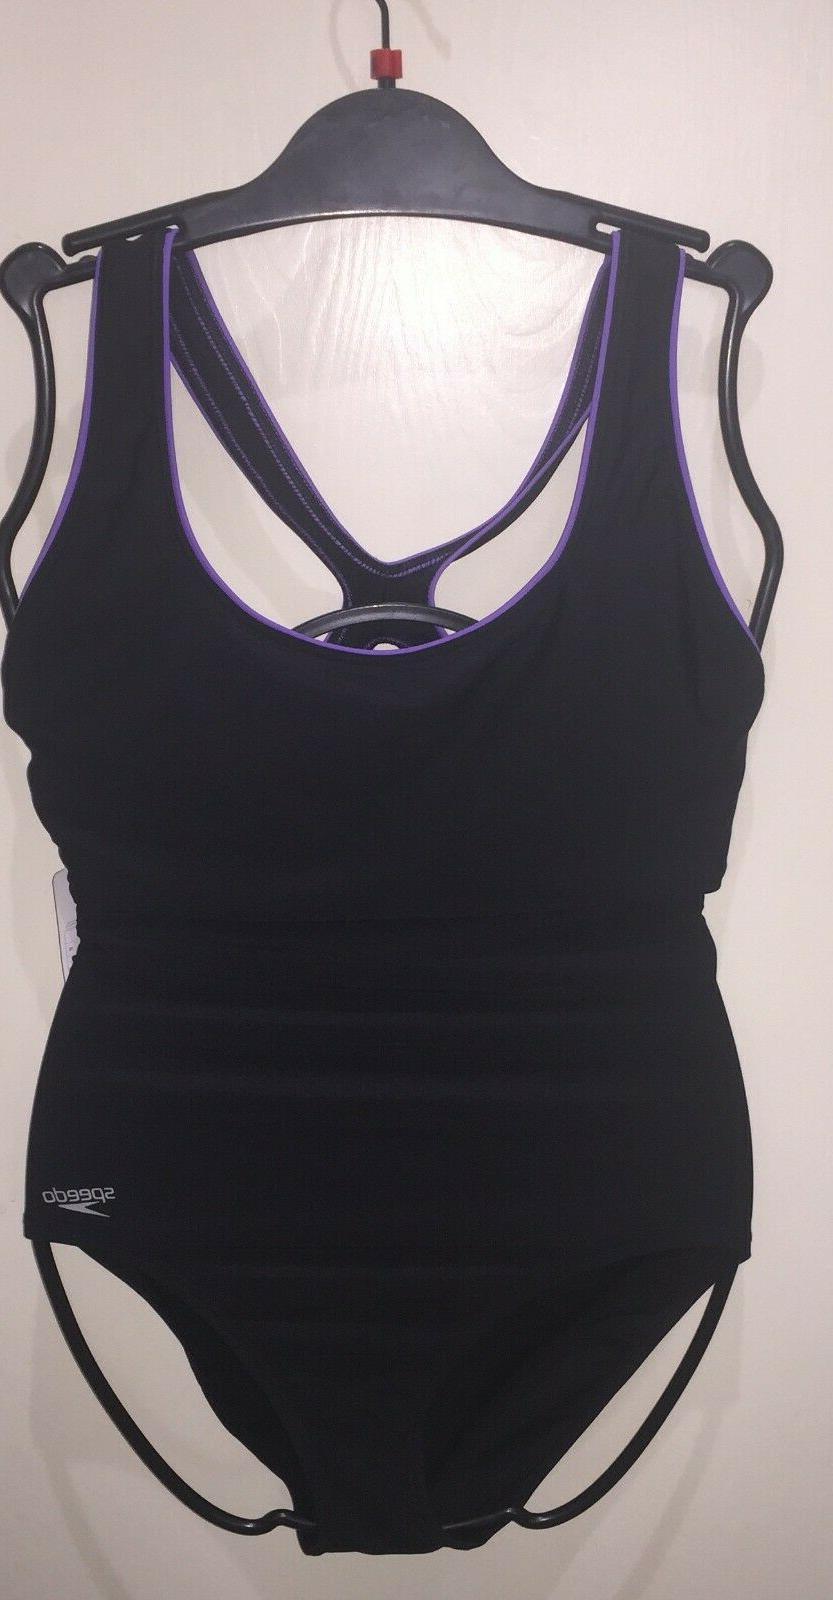 SPEEDO Ultraback Bathing Black Purple New tags